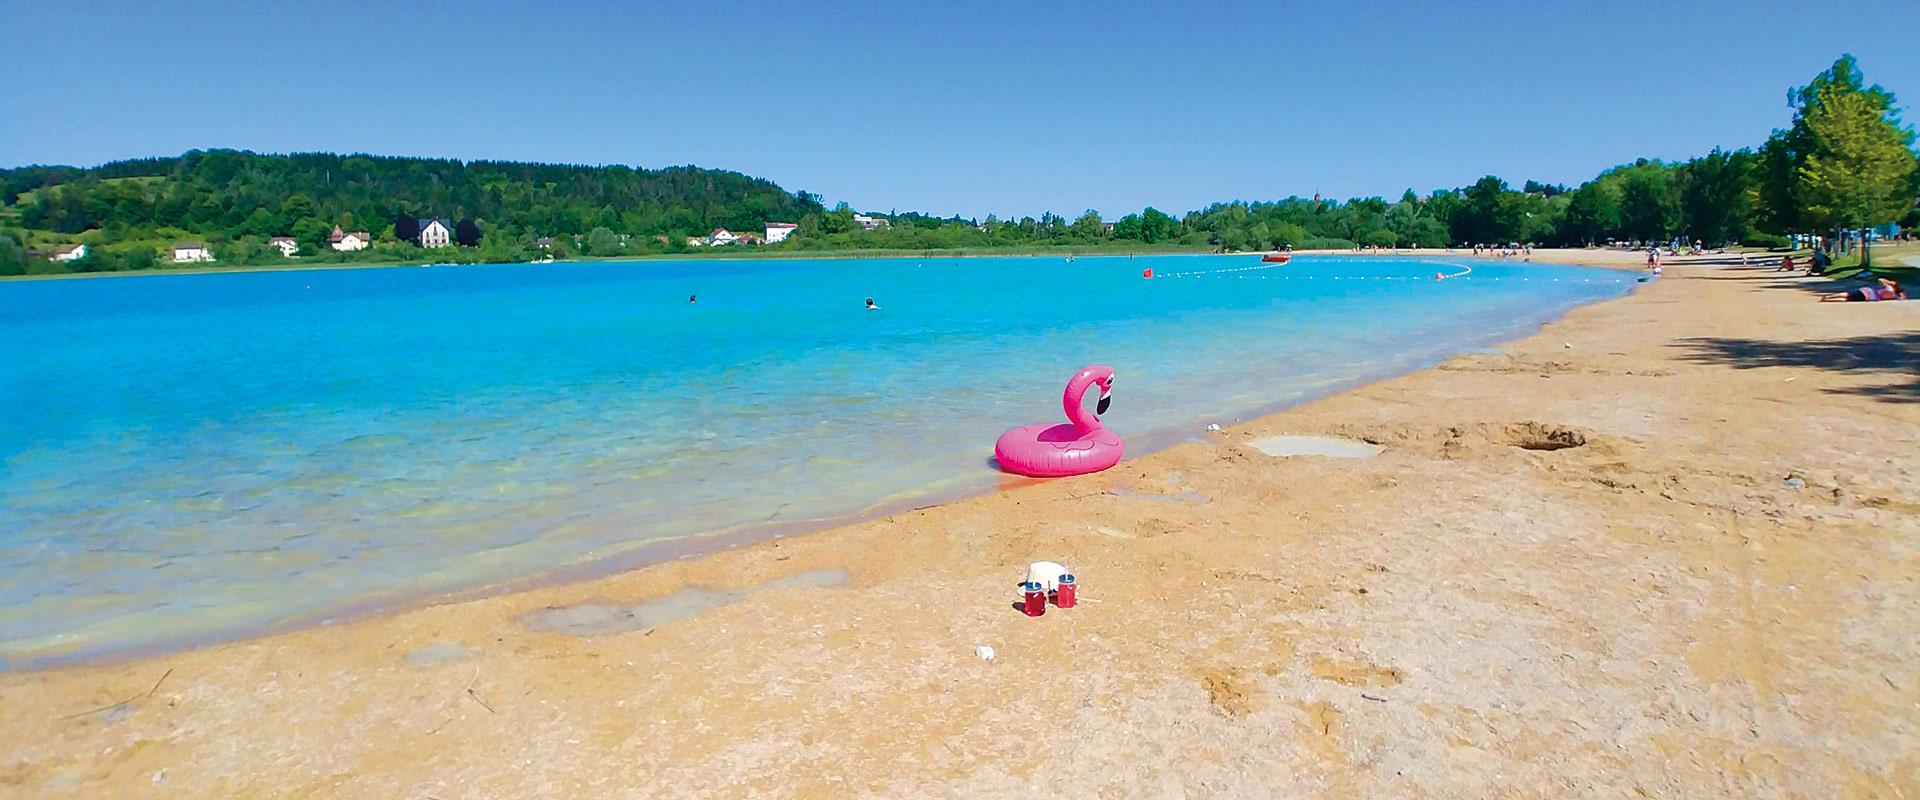 Camping lac jura 3 etoiles avec piscine clairvaux - Camping lac aiguebelette avec piscine ...